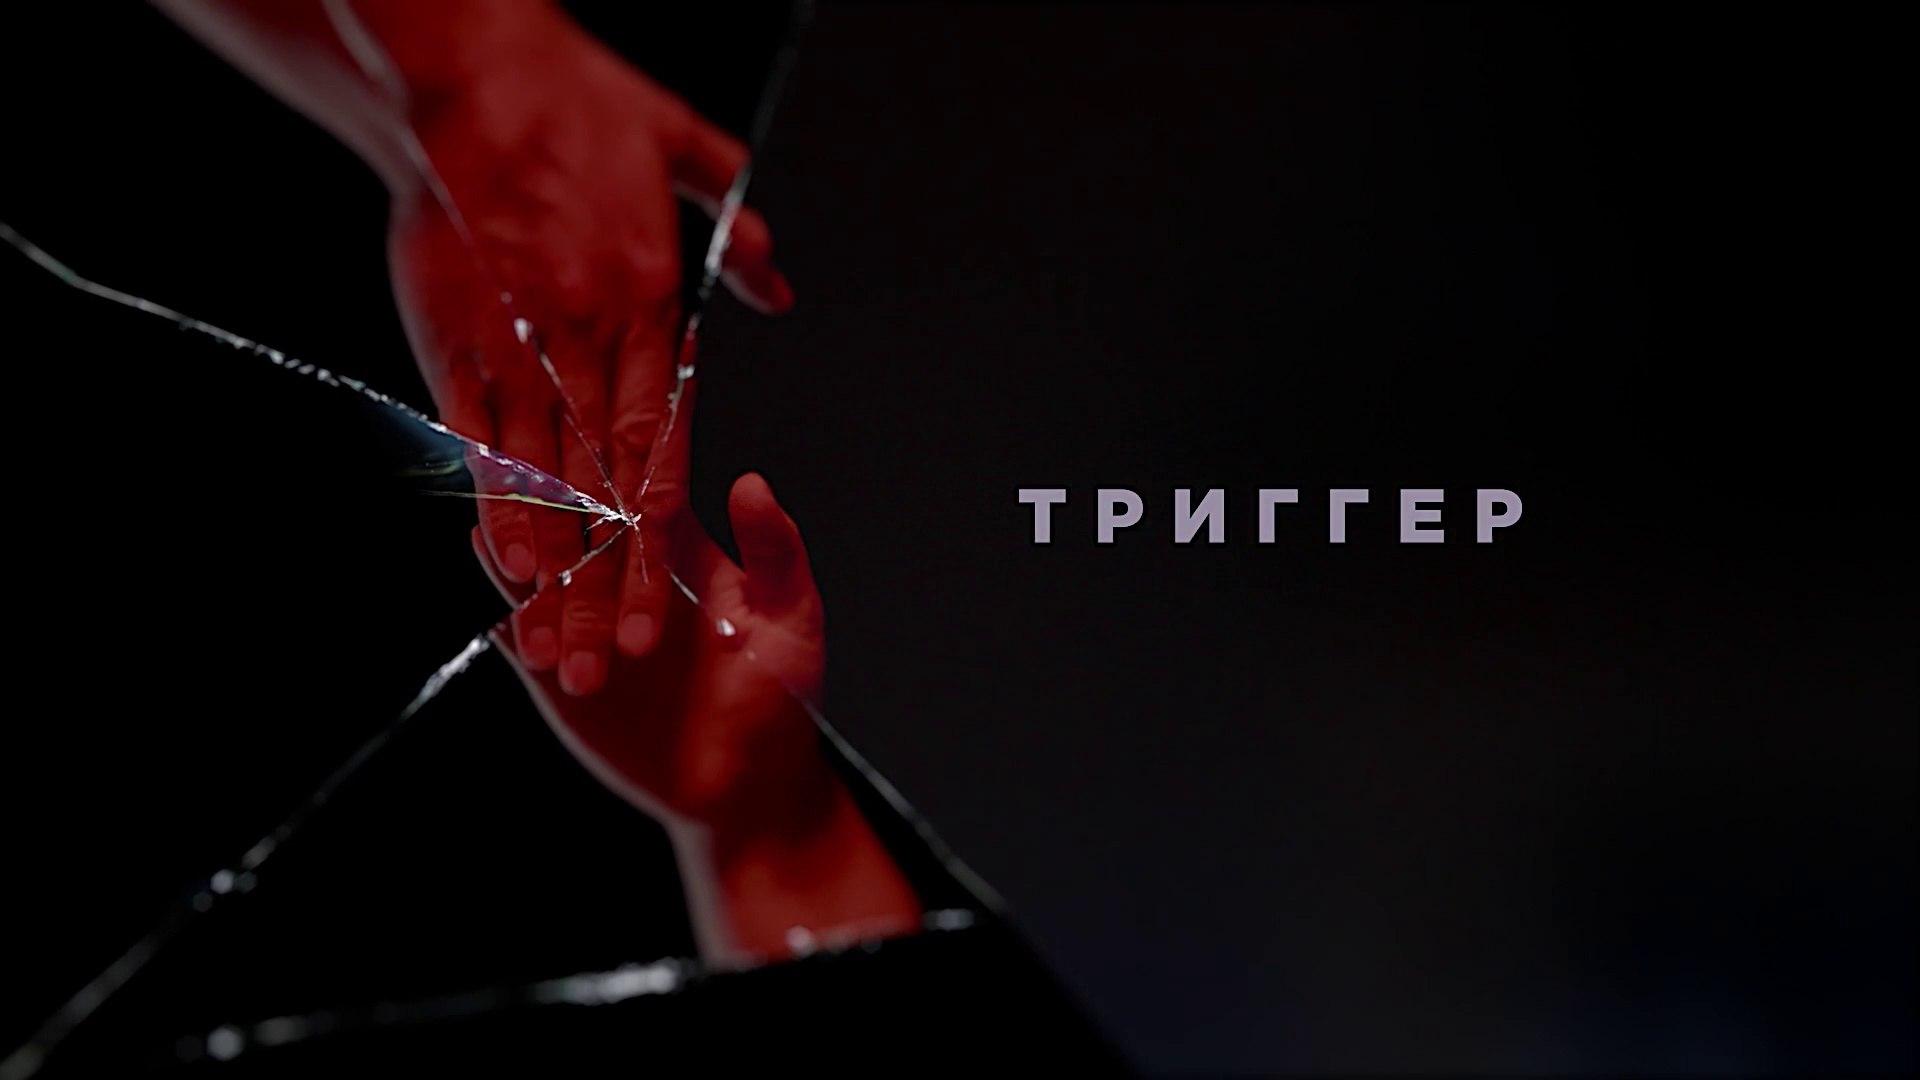 Триггер - 1 серия (2020) HD смотреть онлайн